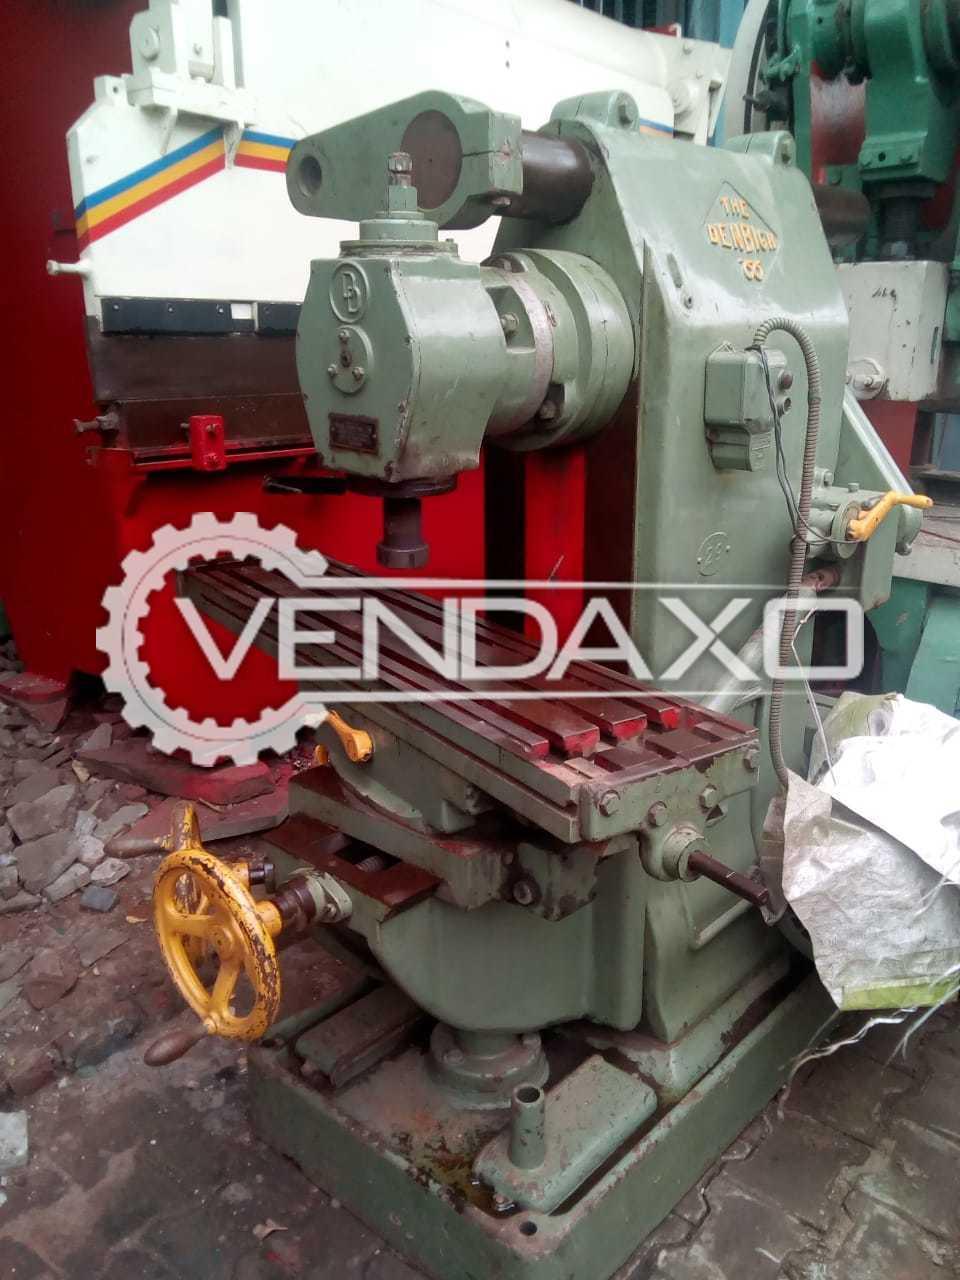 Dufour 221R Universal Milling Machine